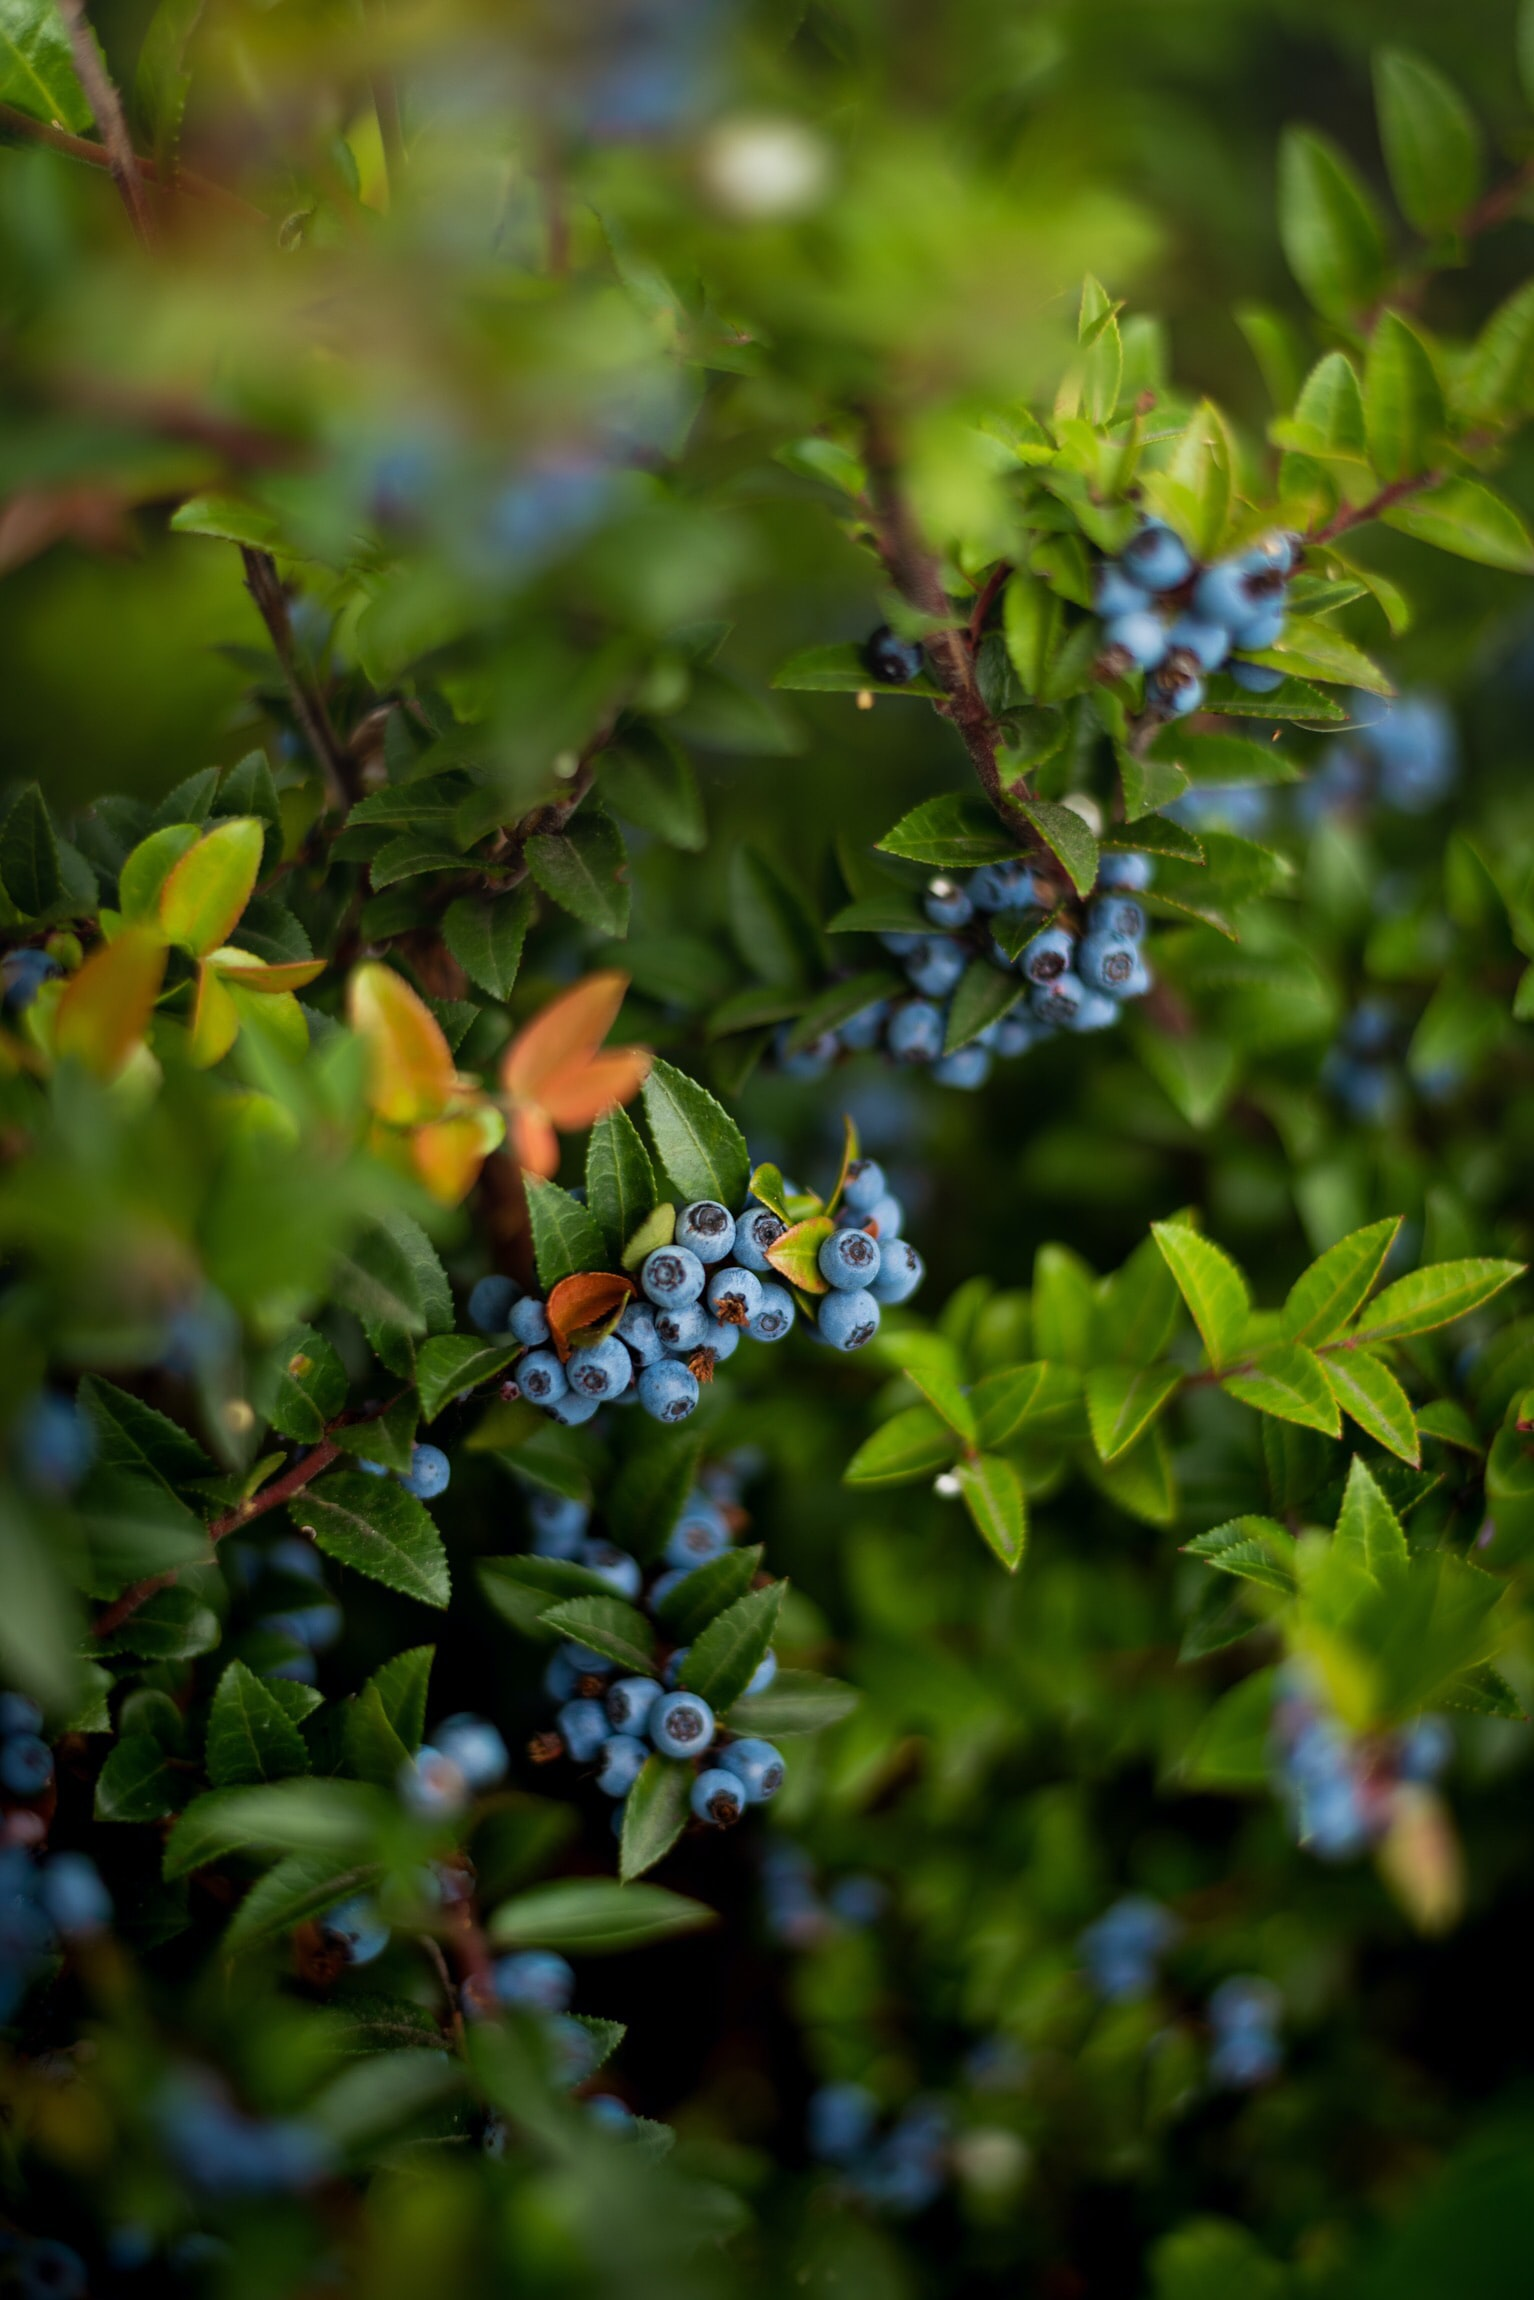 berries on plant